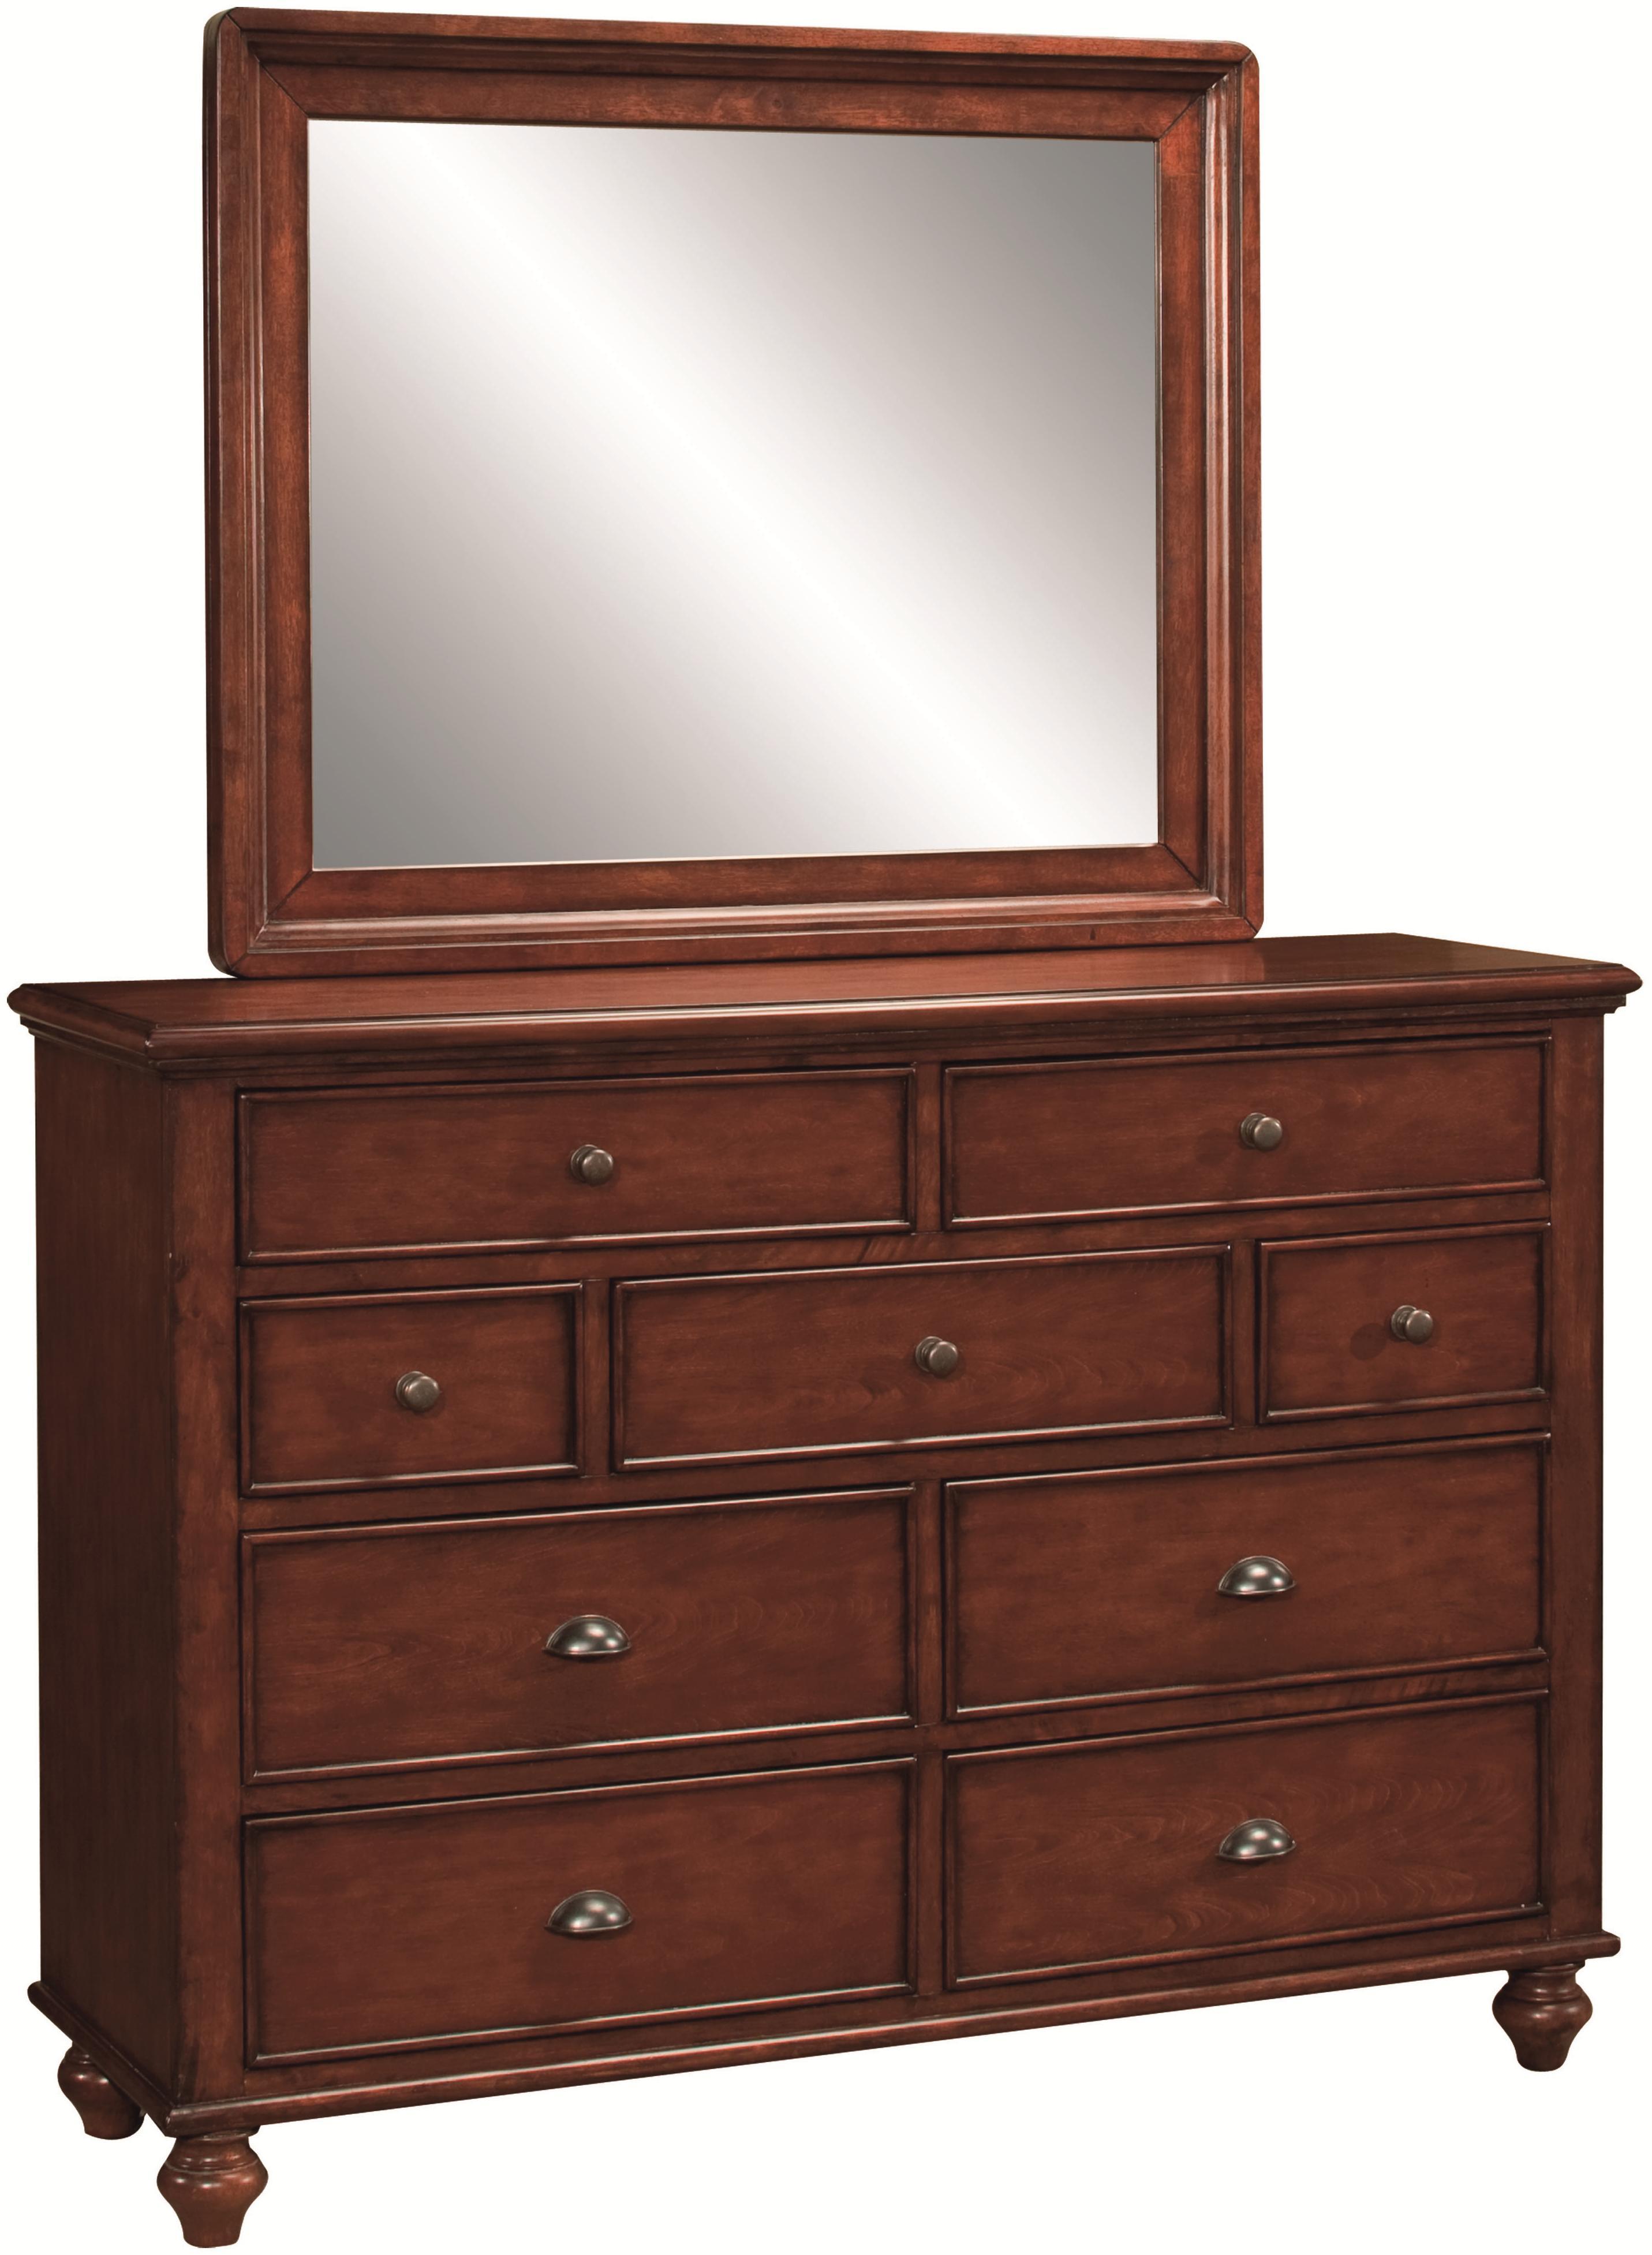 Aspenhome Madison Chesser & Mirror - Item Number: IA200-455-BRH+IA200-463-BRH